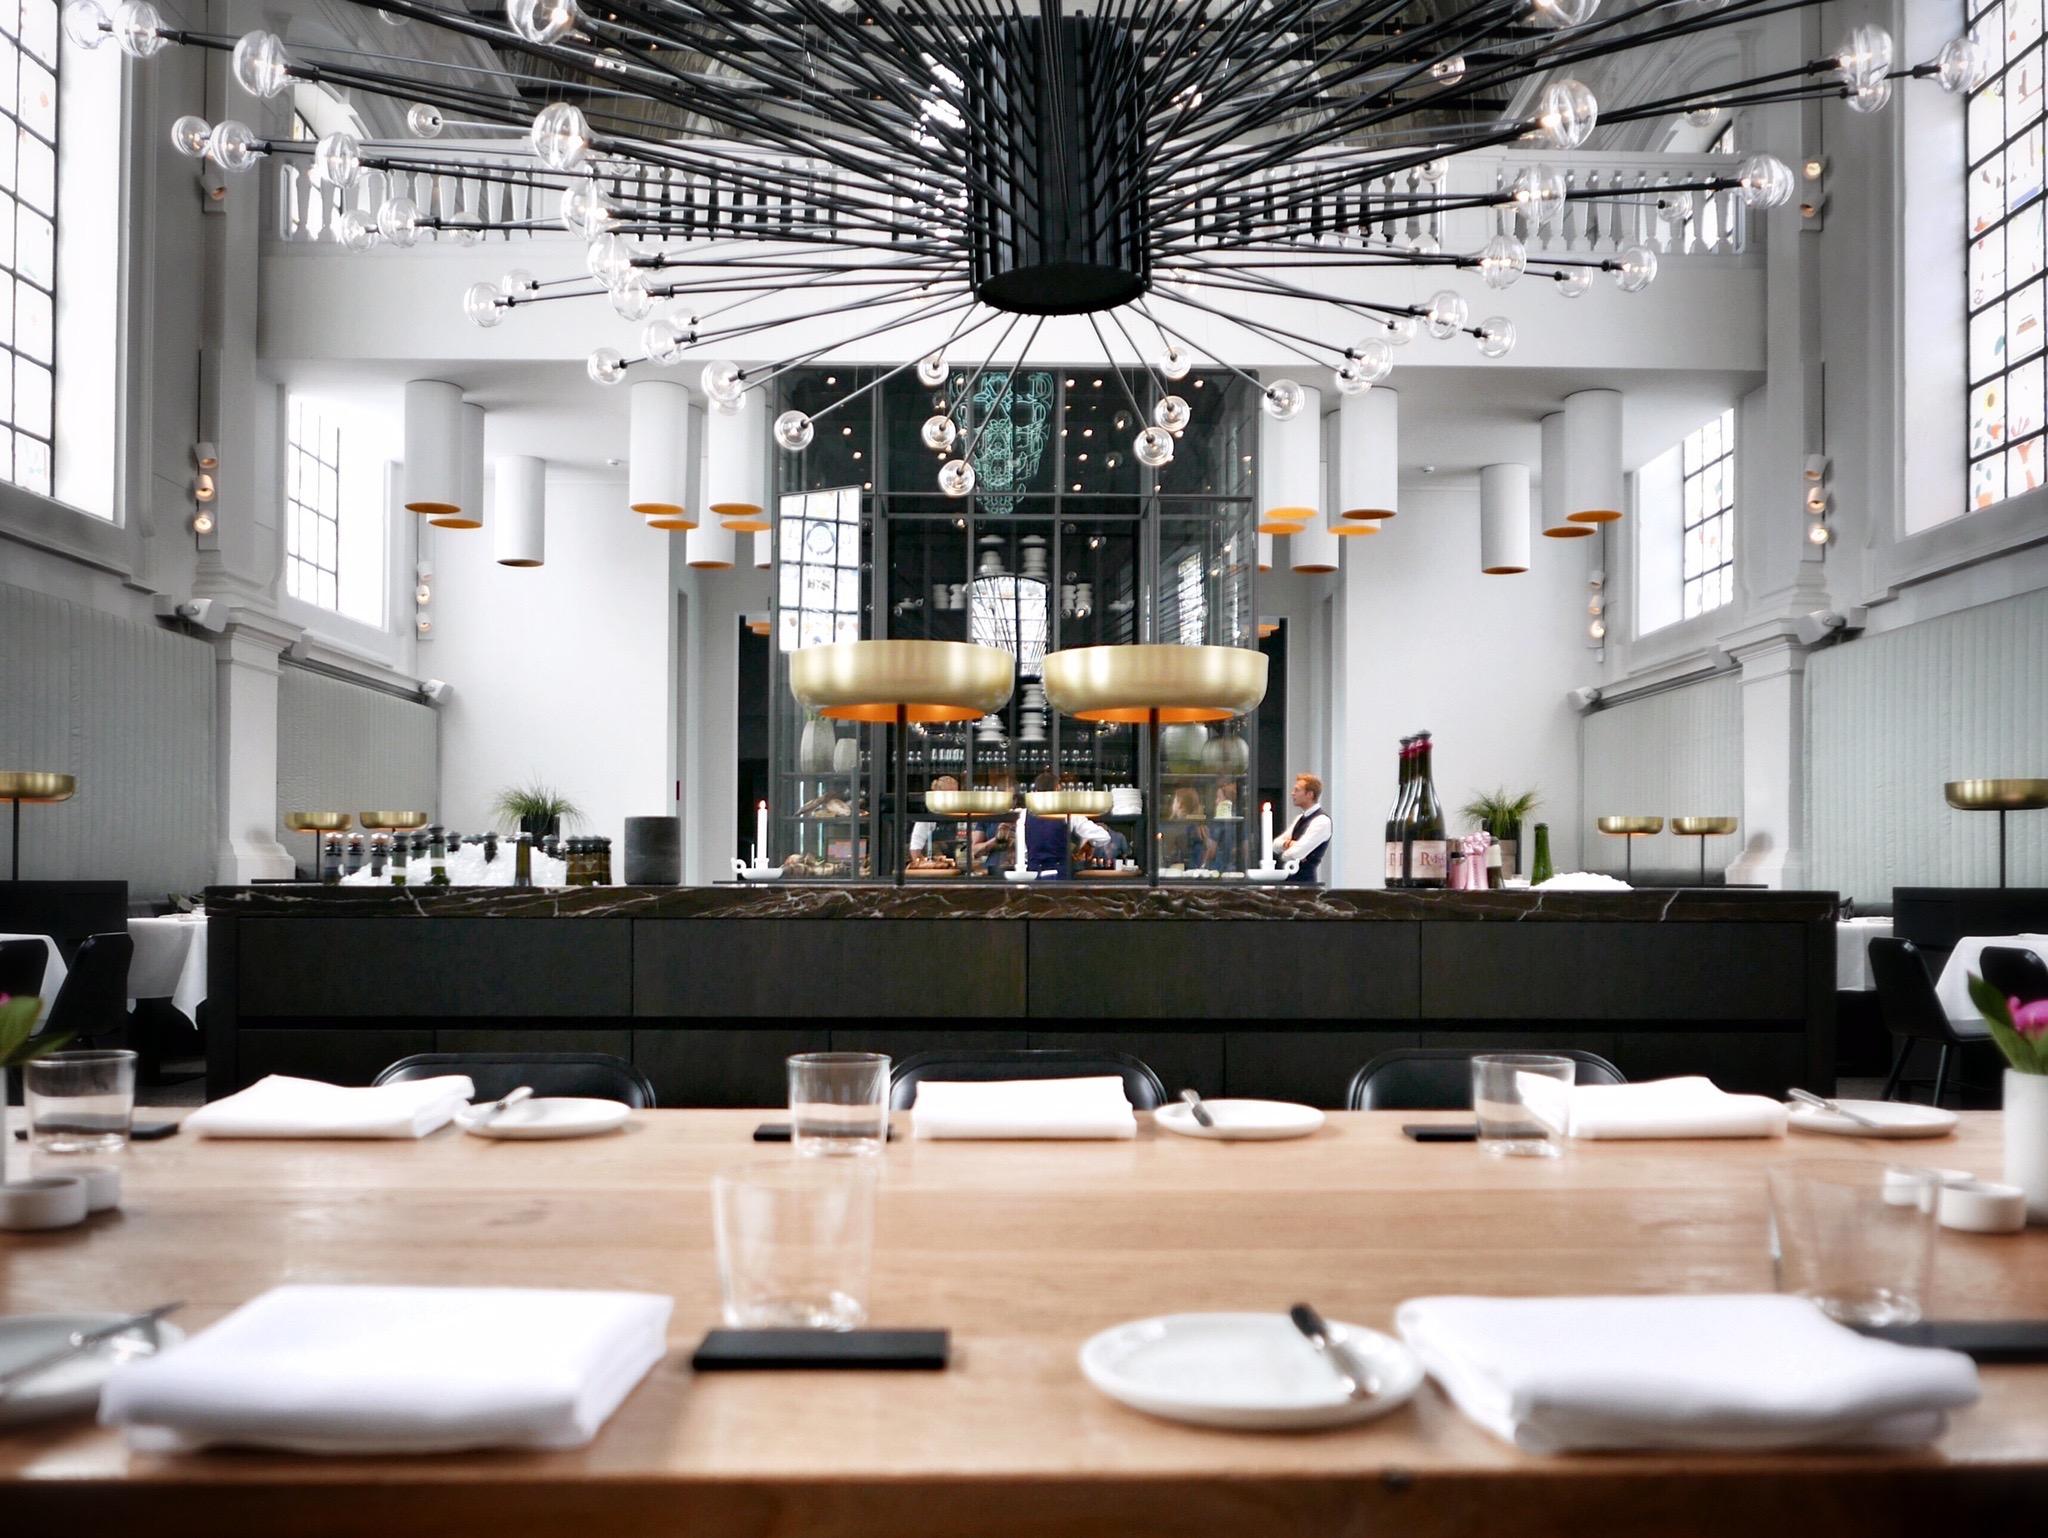 Los 5 mejores dise os del mundo en restaurantes for Disenos para bares